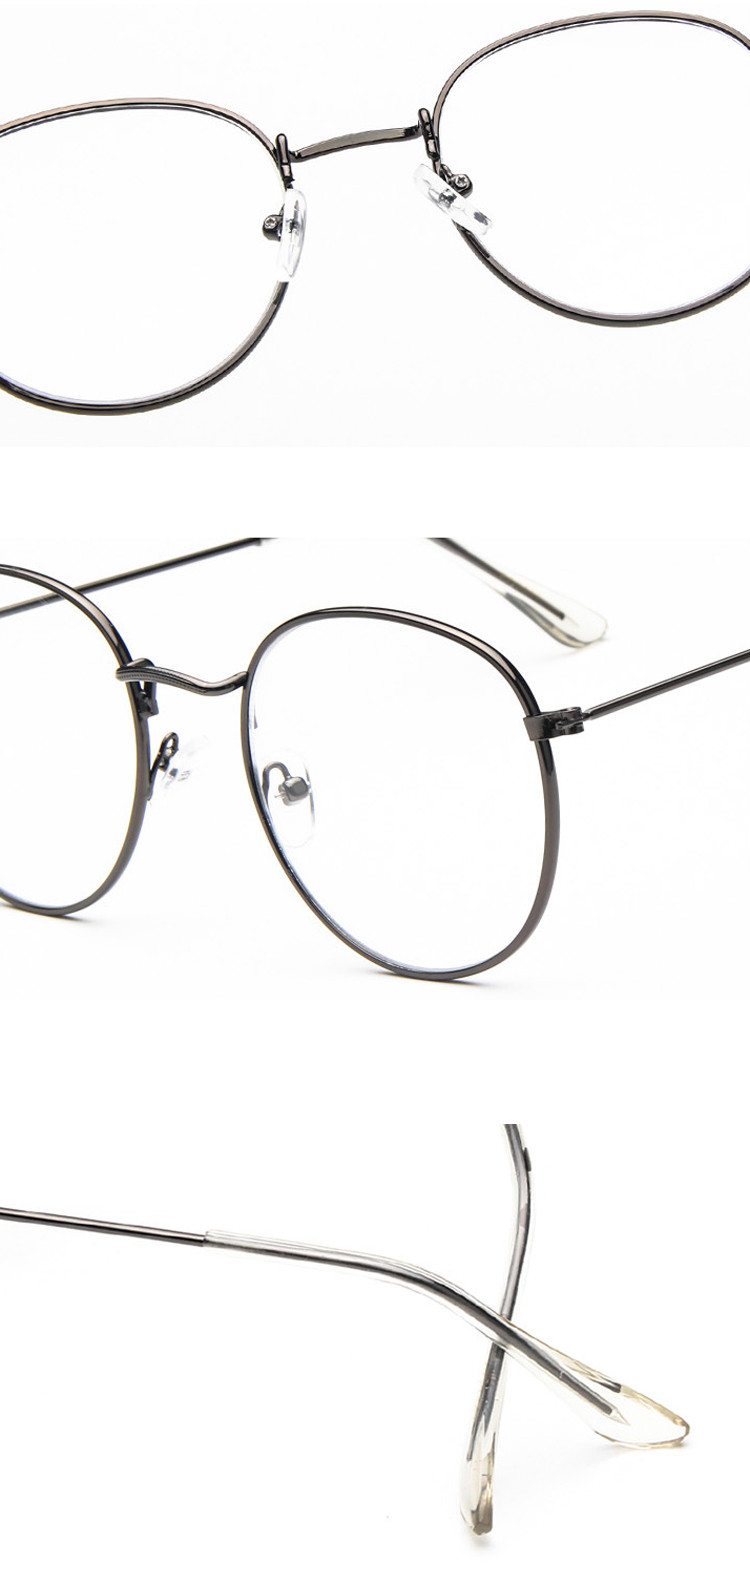 16fad82d65 2019 Wholesale Fashion Vintage Women Eye Glasses Frames Plain Mirror ...